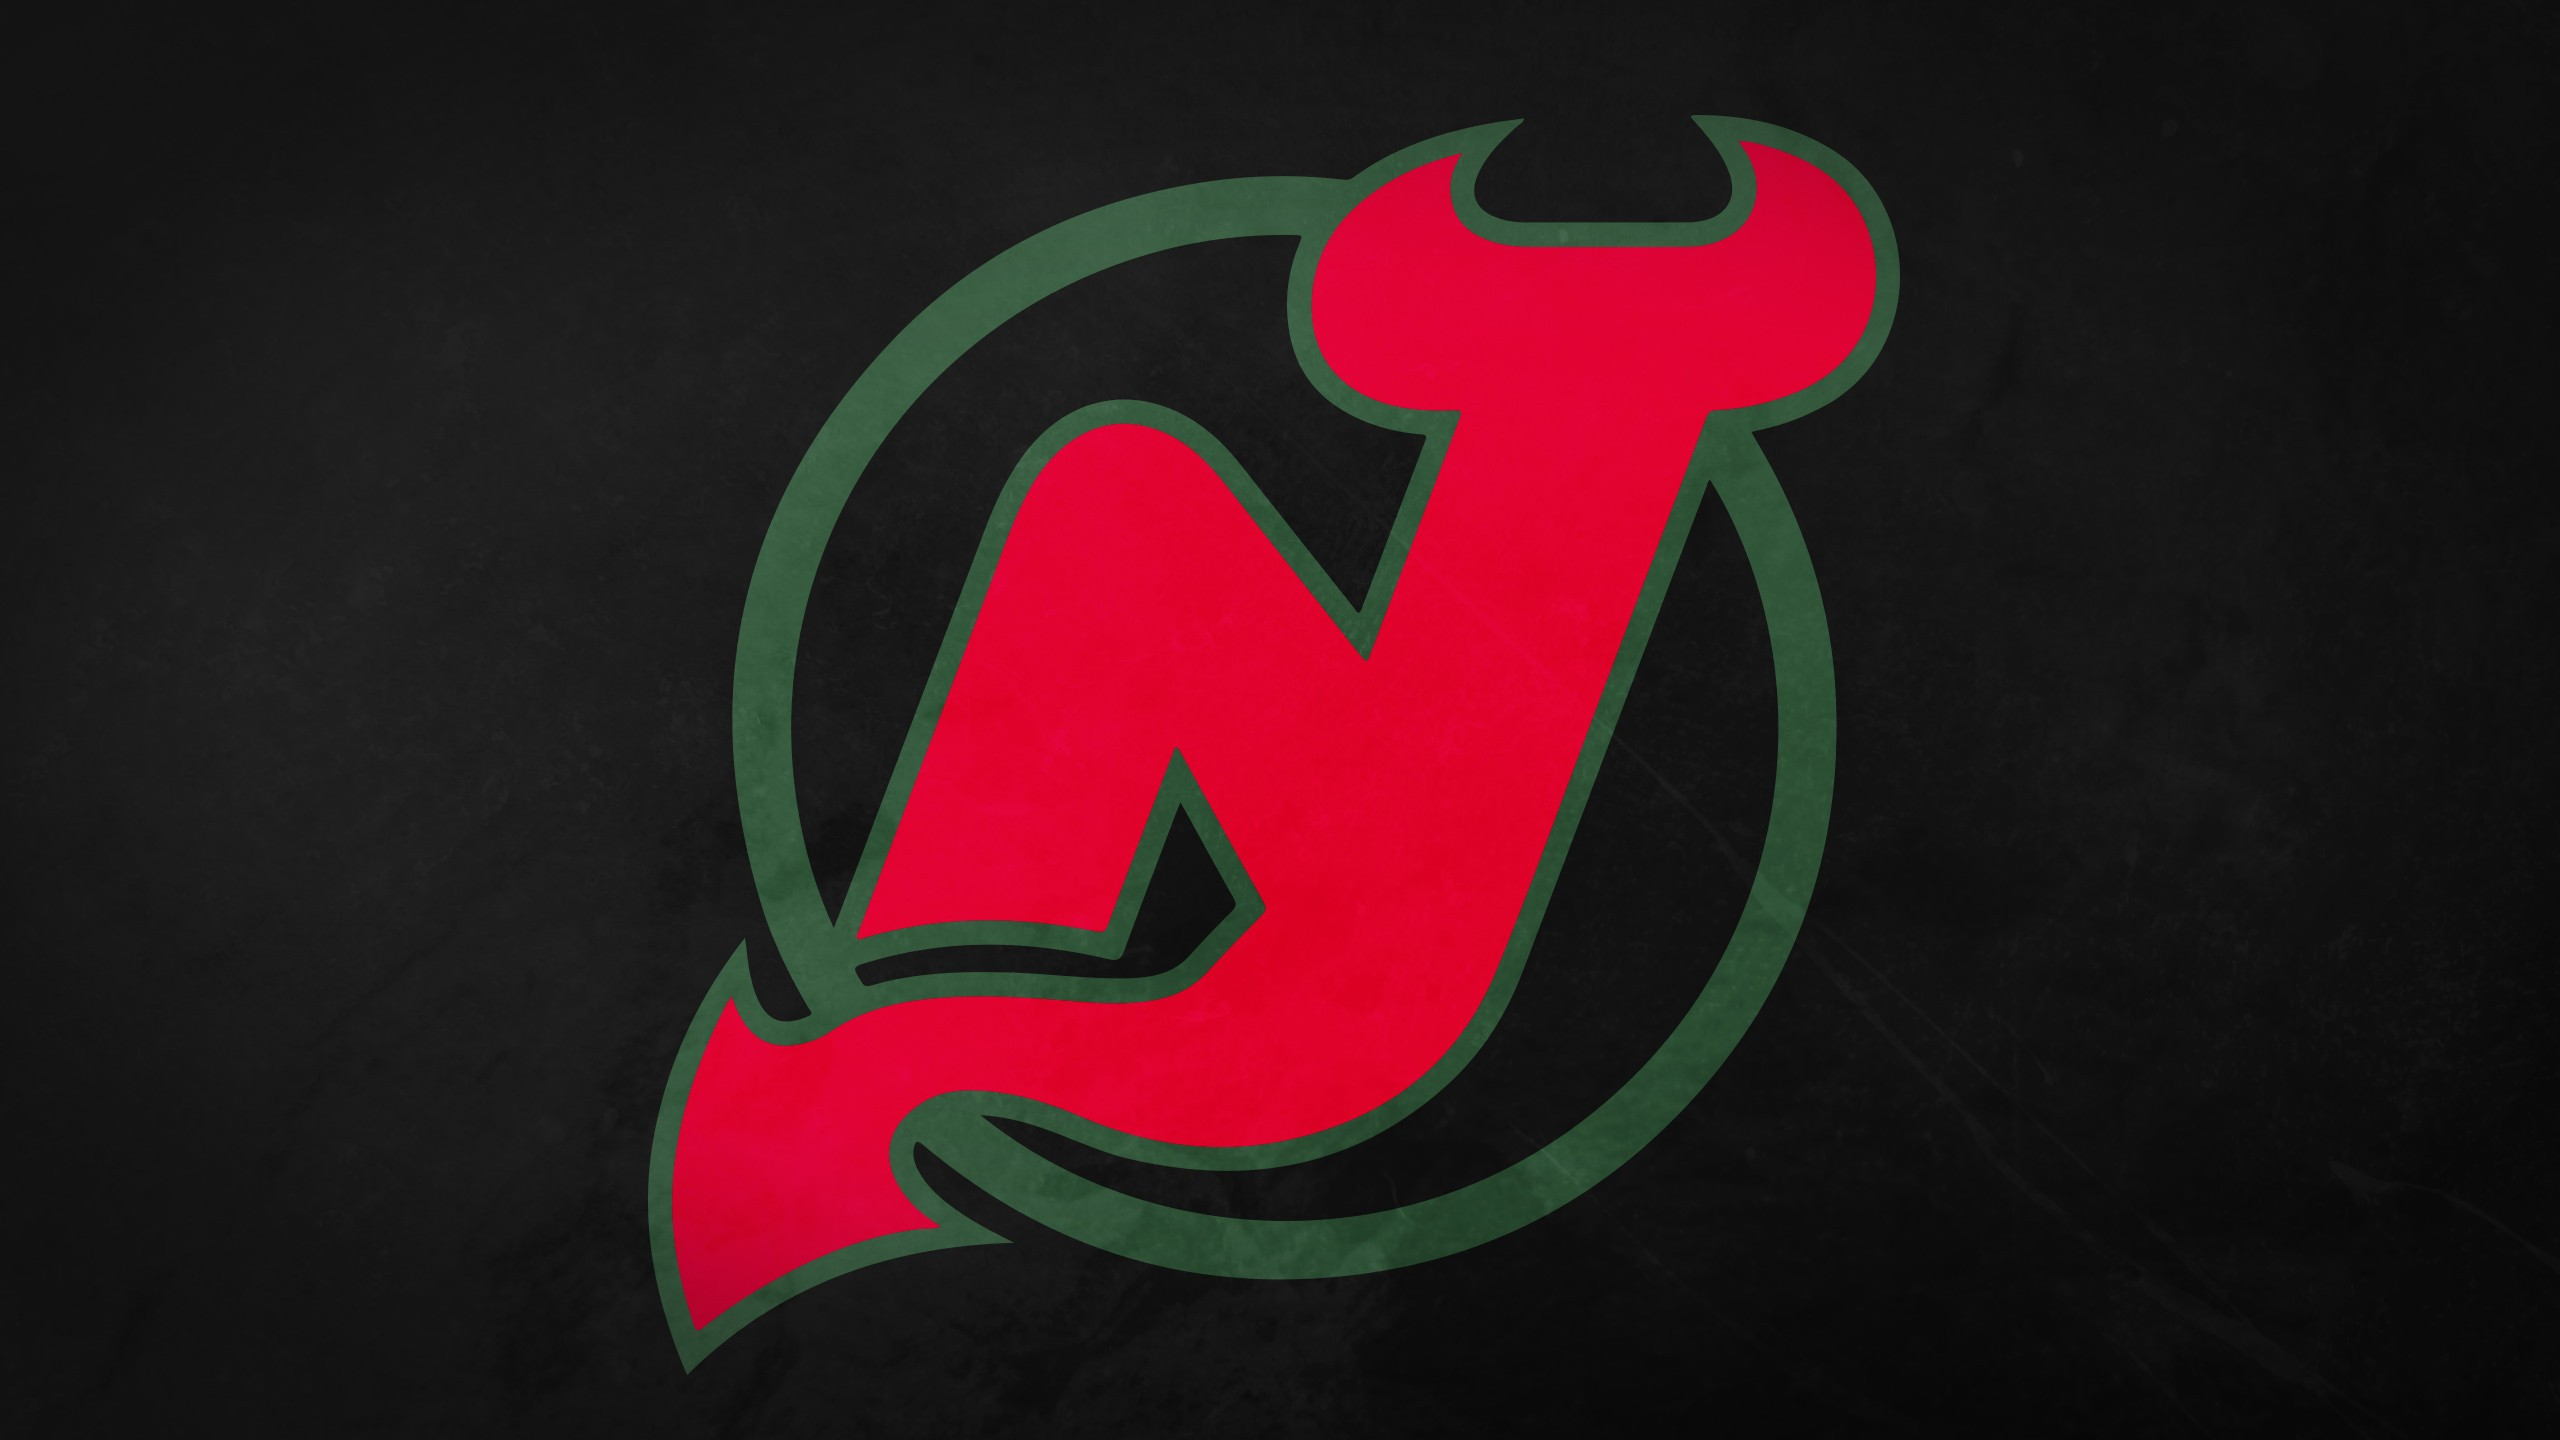 New Jersey Devils Computer Wallpaper Desktop Background 2560x1440 2560x1440